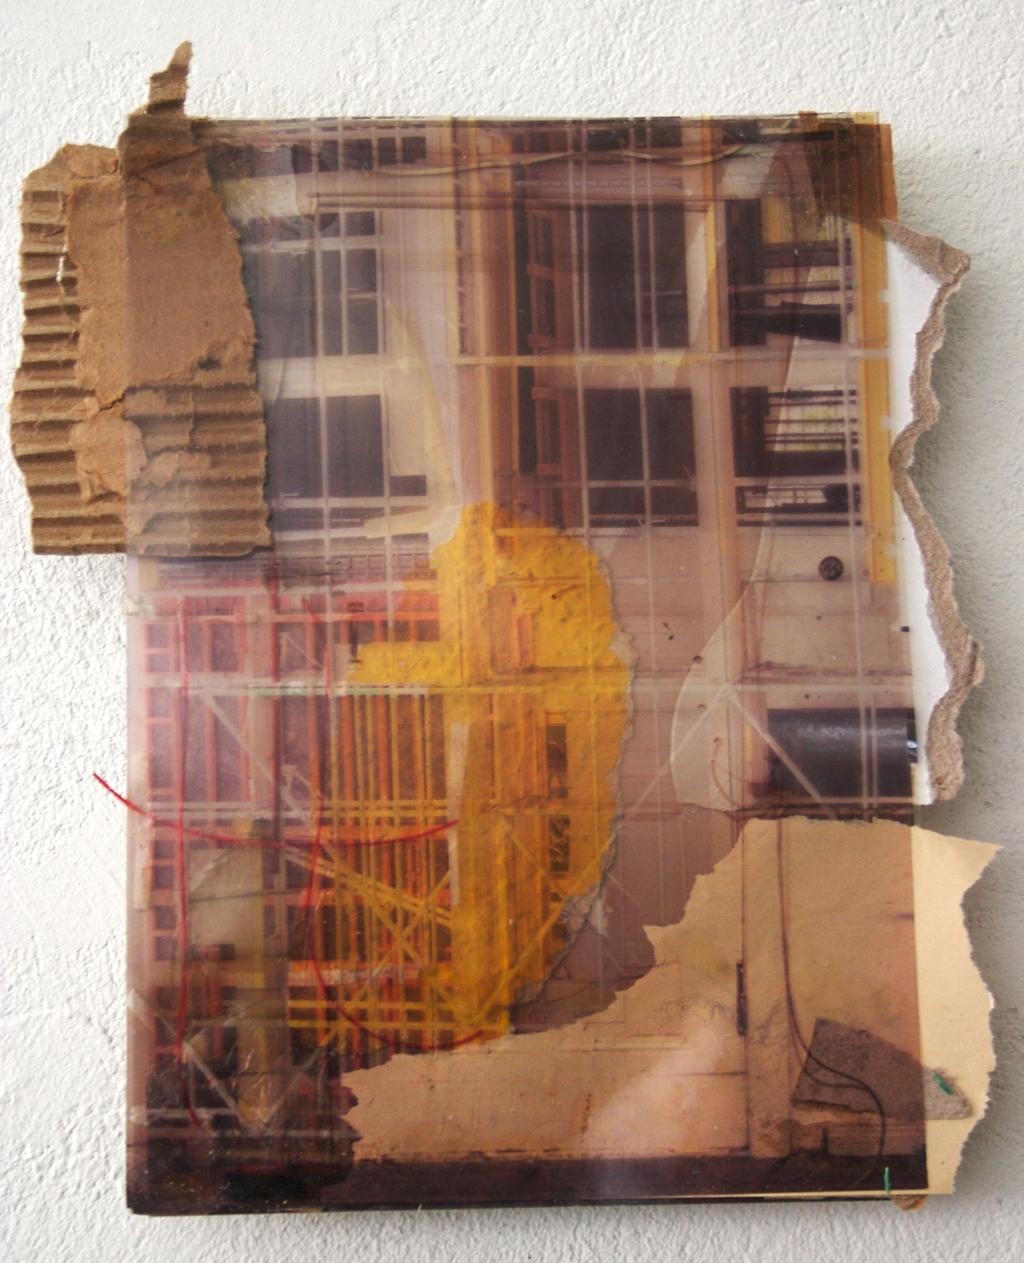 Karl-marx-strasse-berlin, 24 x 30 cm, collage, 2008, Jane Hughes